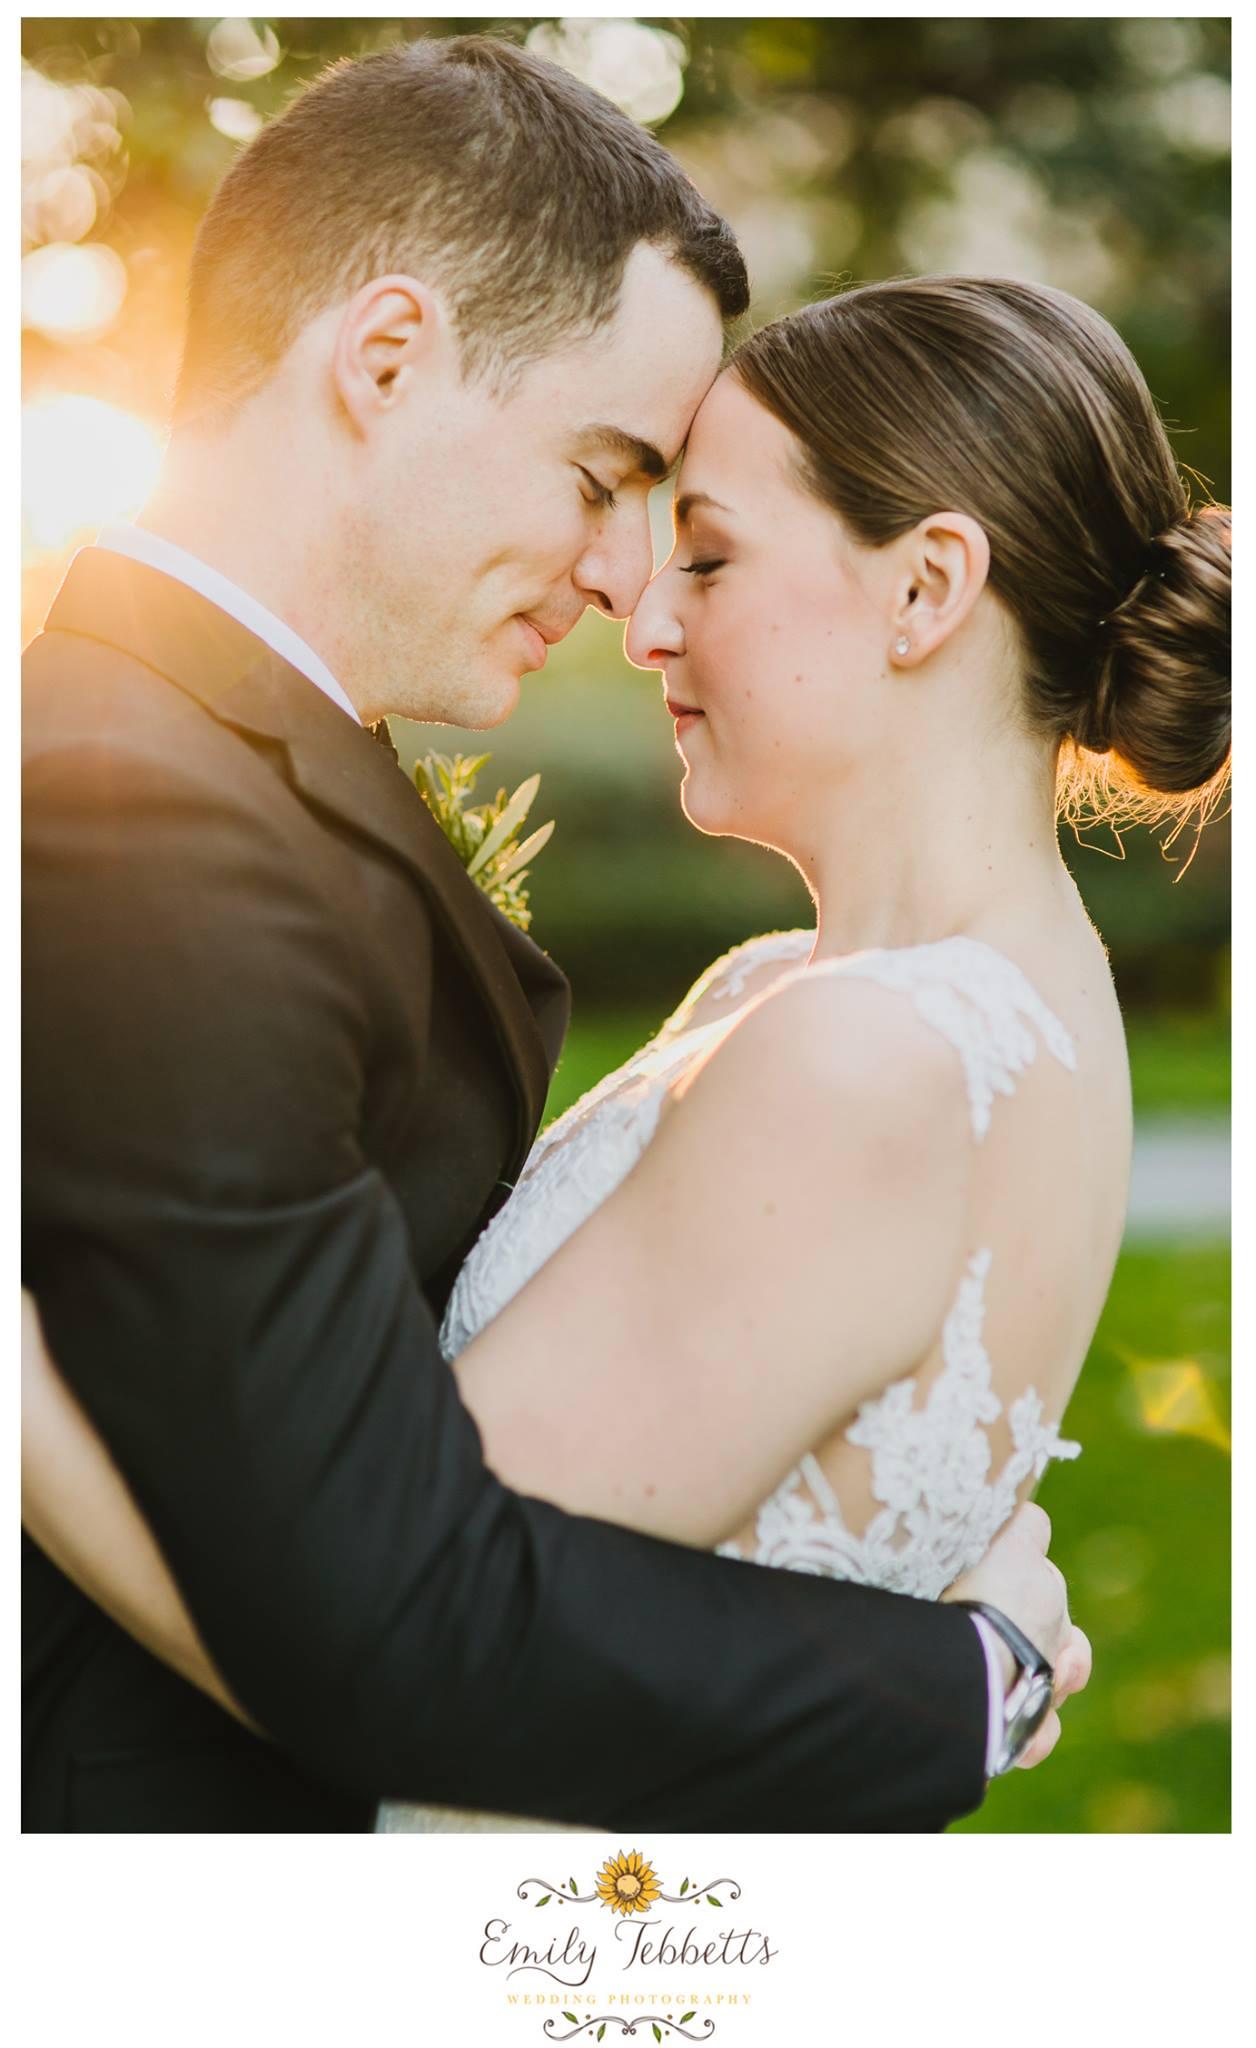 Boston, MA - Emily Tebbetts Wedding Photography 8.jpg